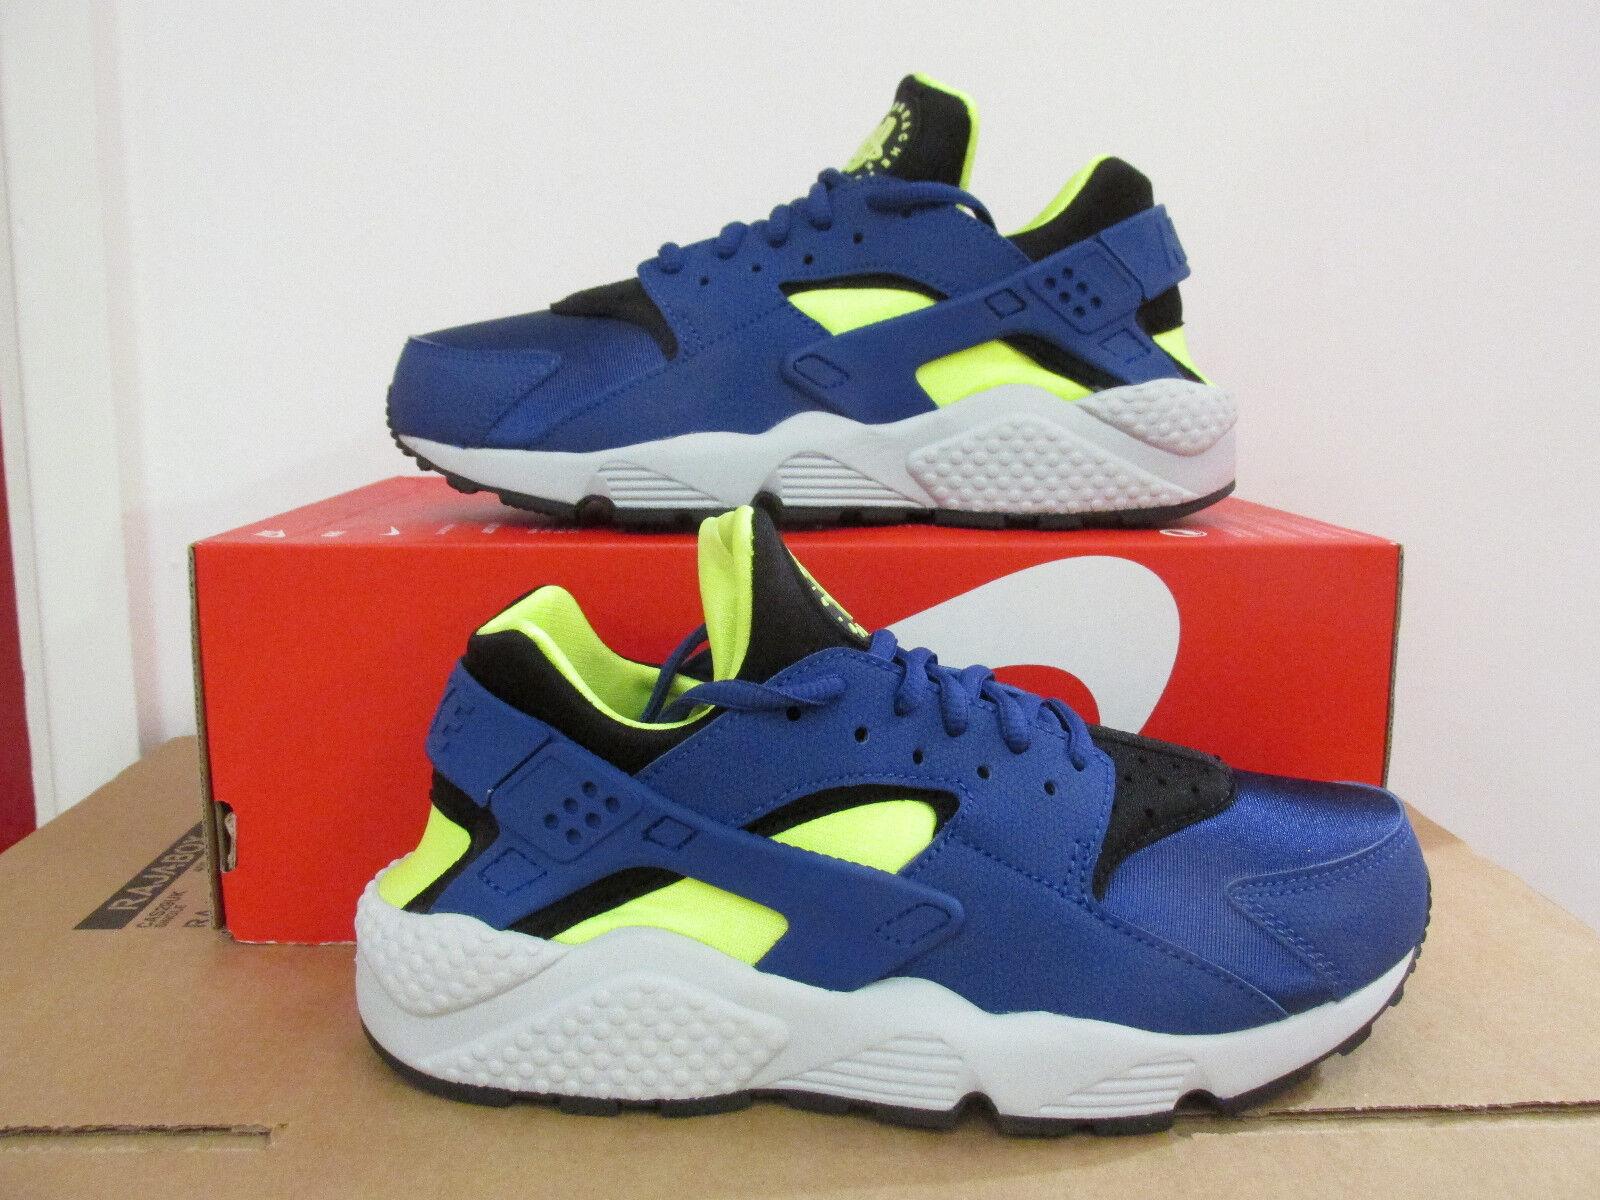 Nike air huarache run womens running trainers 634835 402 sneakers shoe CLEARANCE